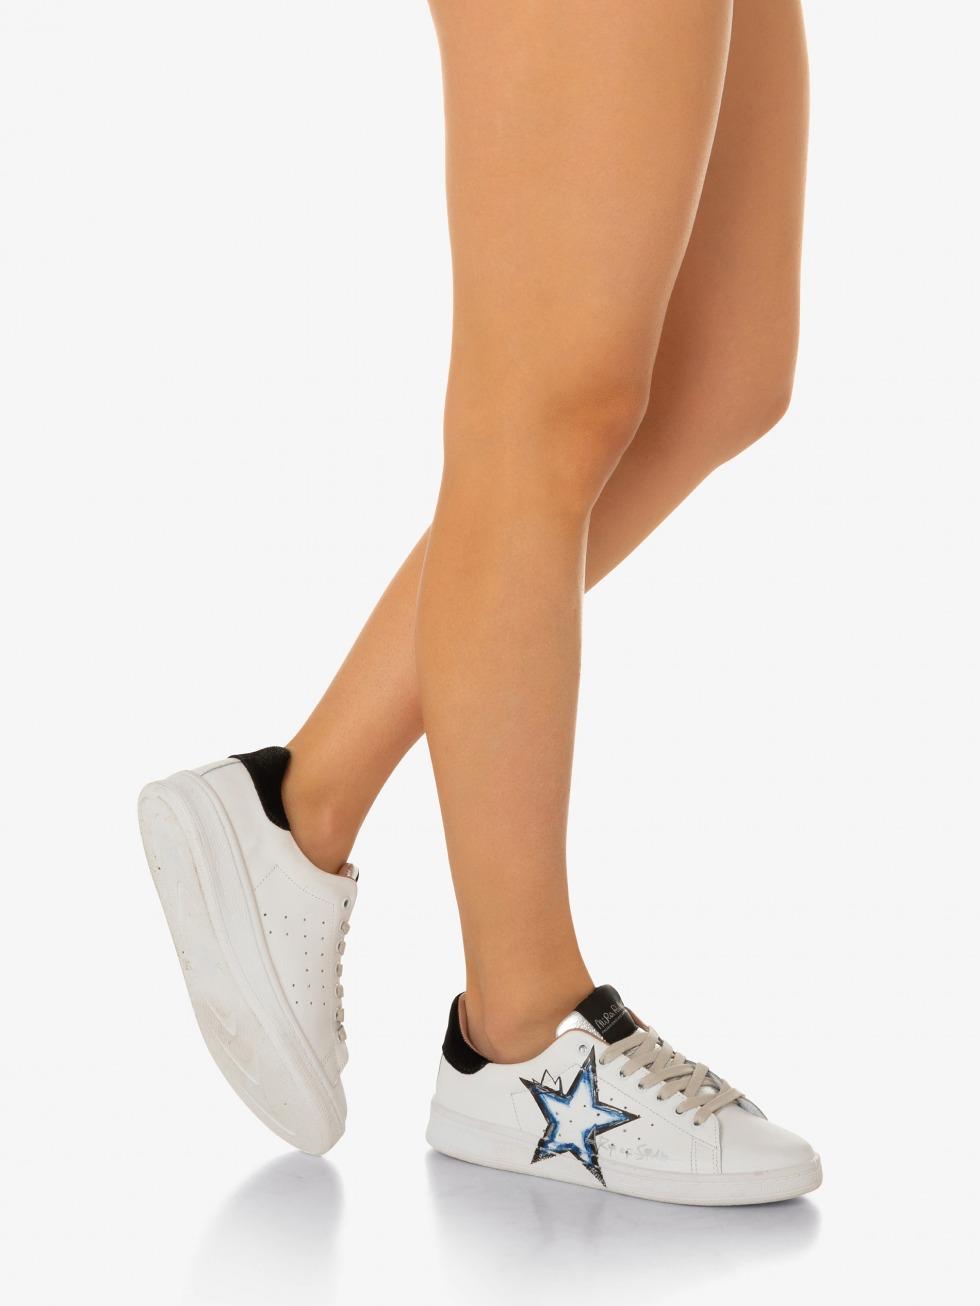 Daiquiri Sneakers - Black Art of Star Blue